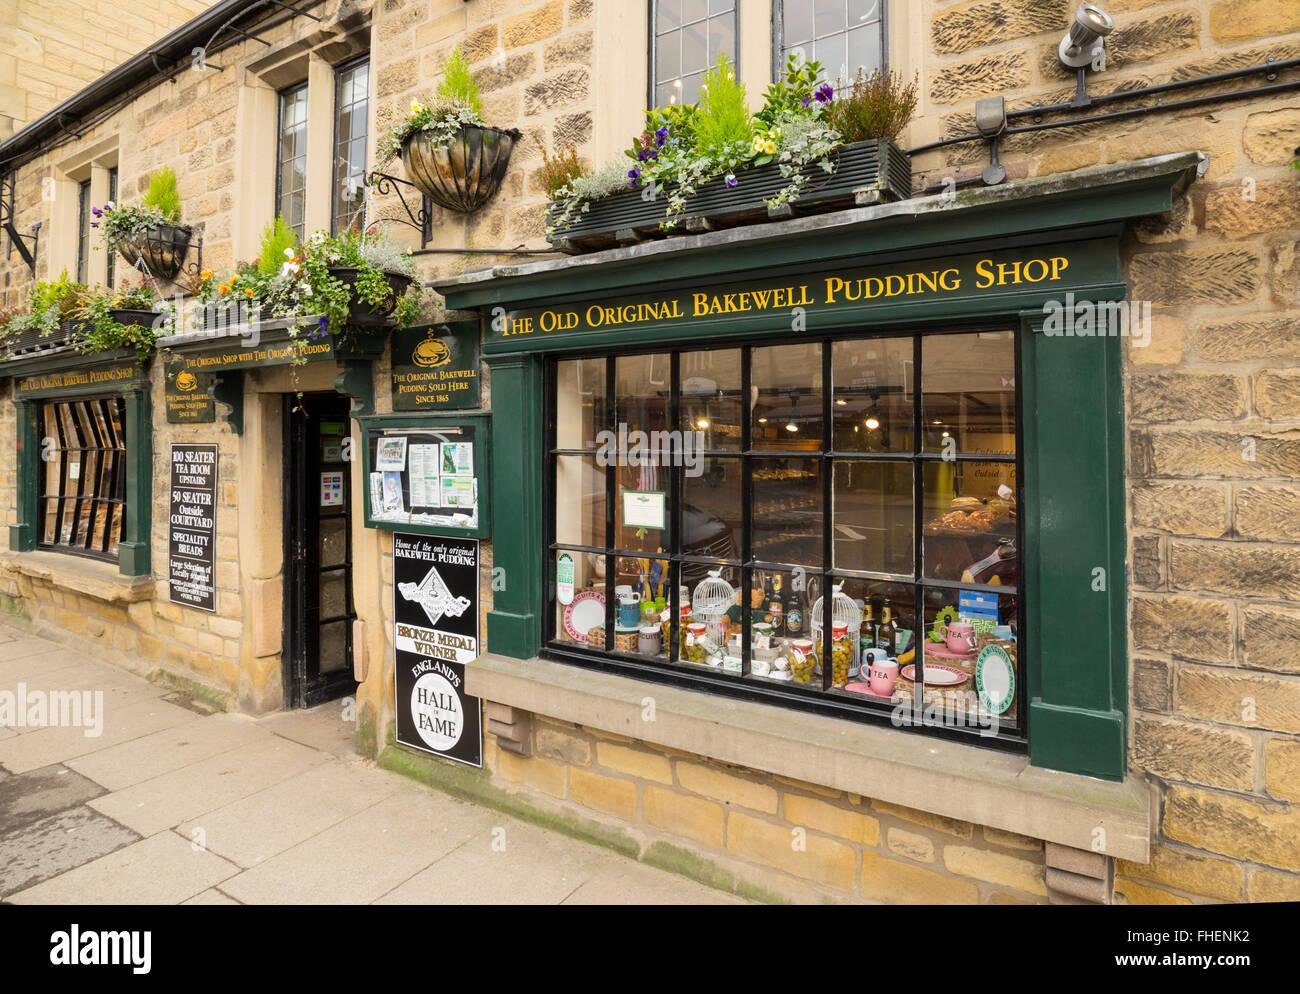 The Origonal Bakewell Pudding Shop - Stock Image